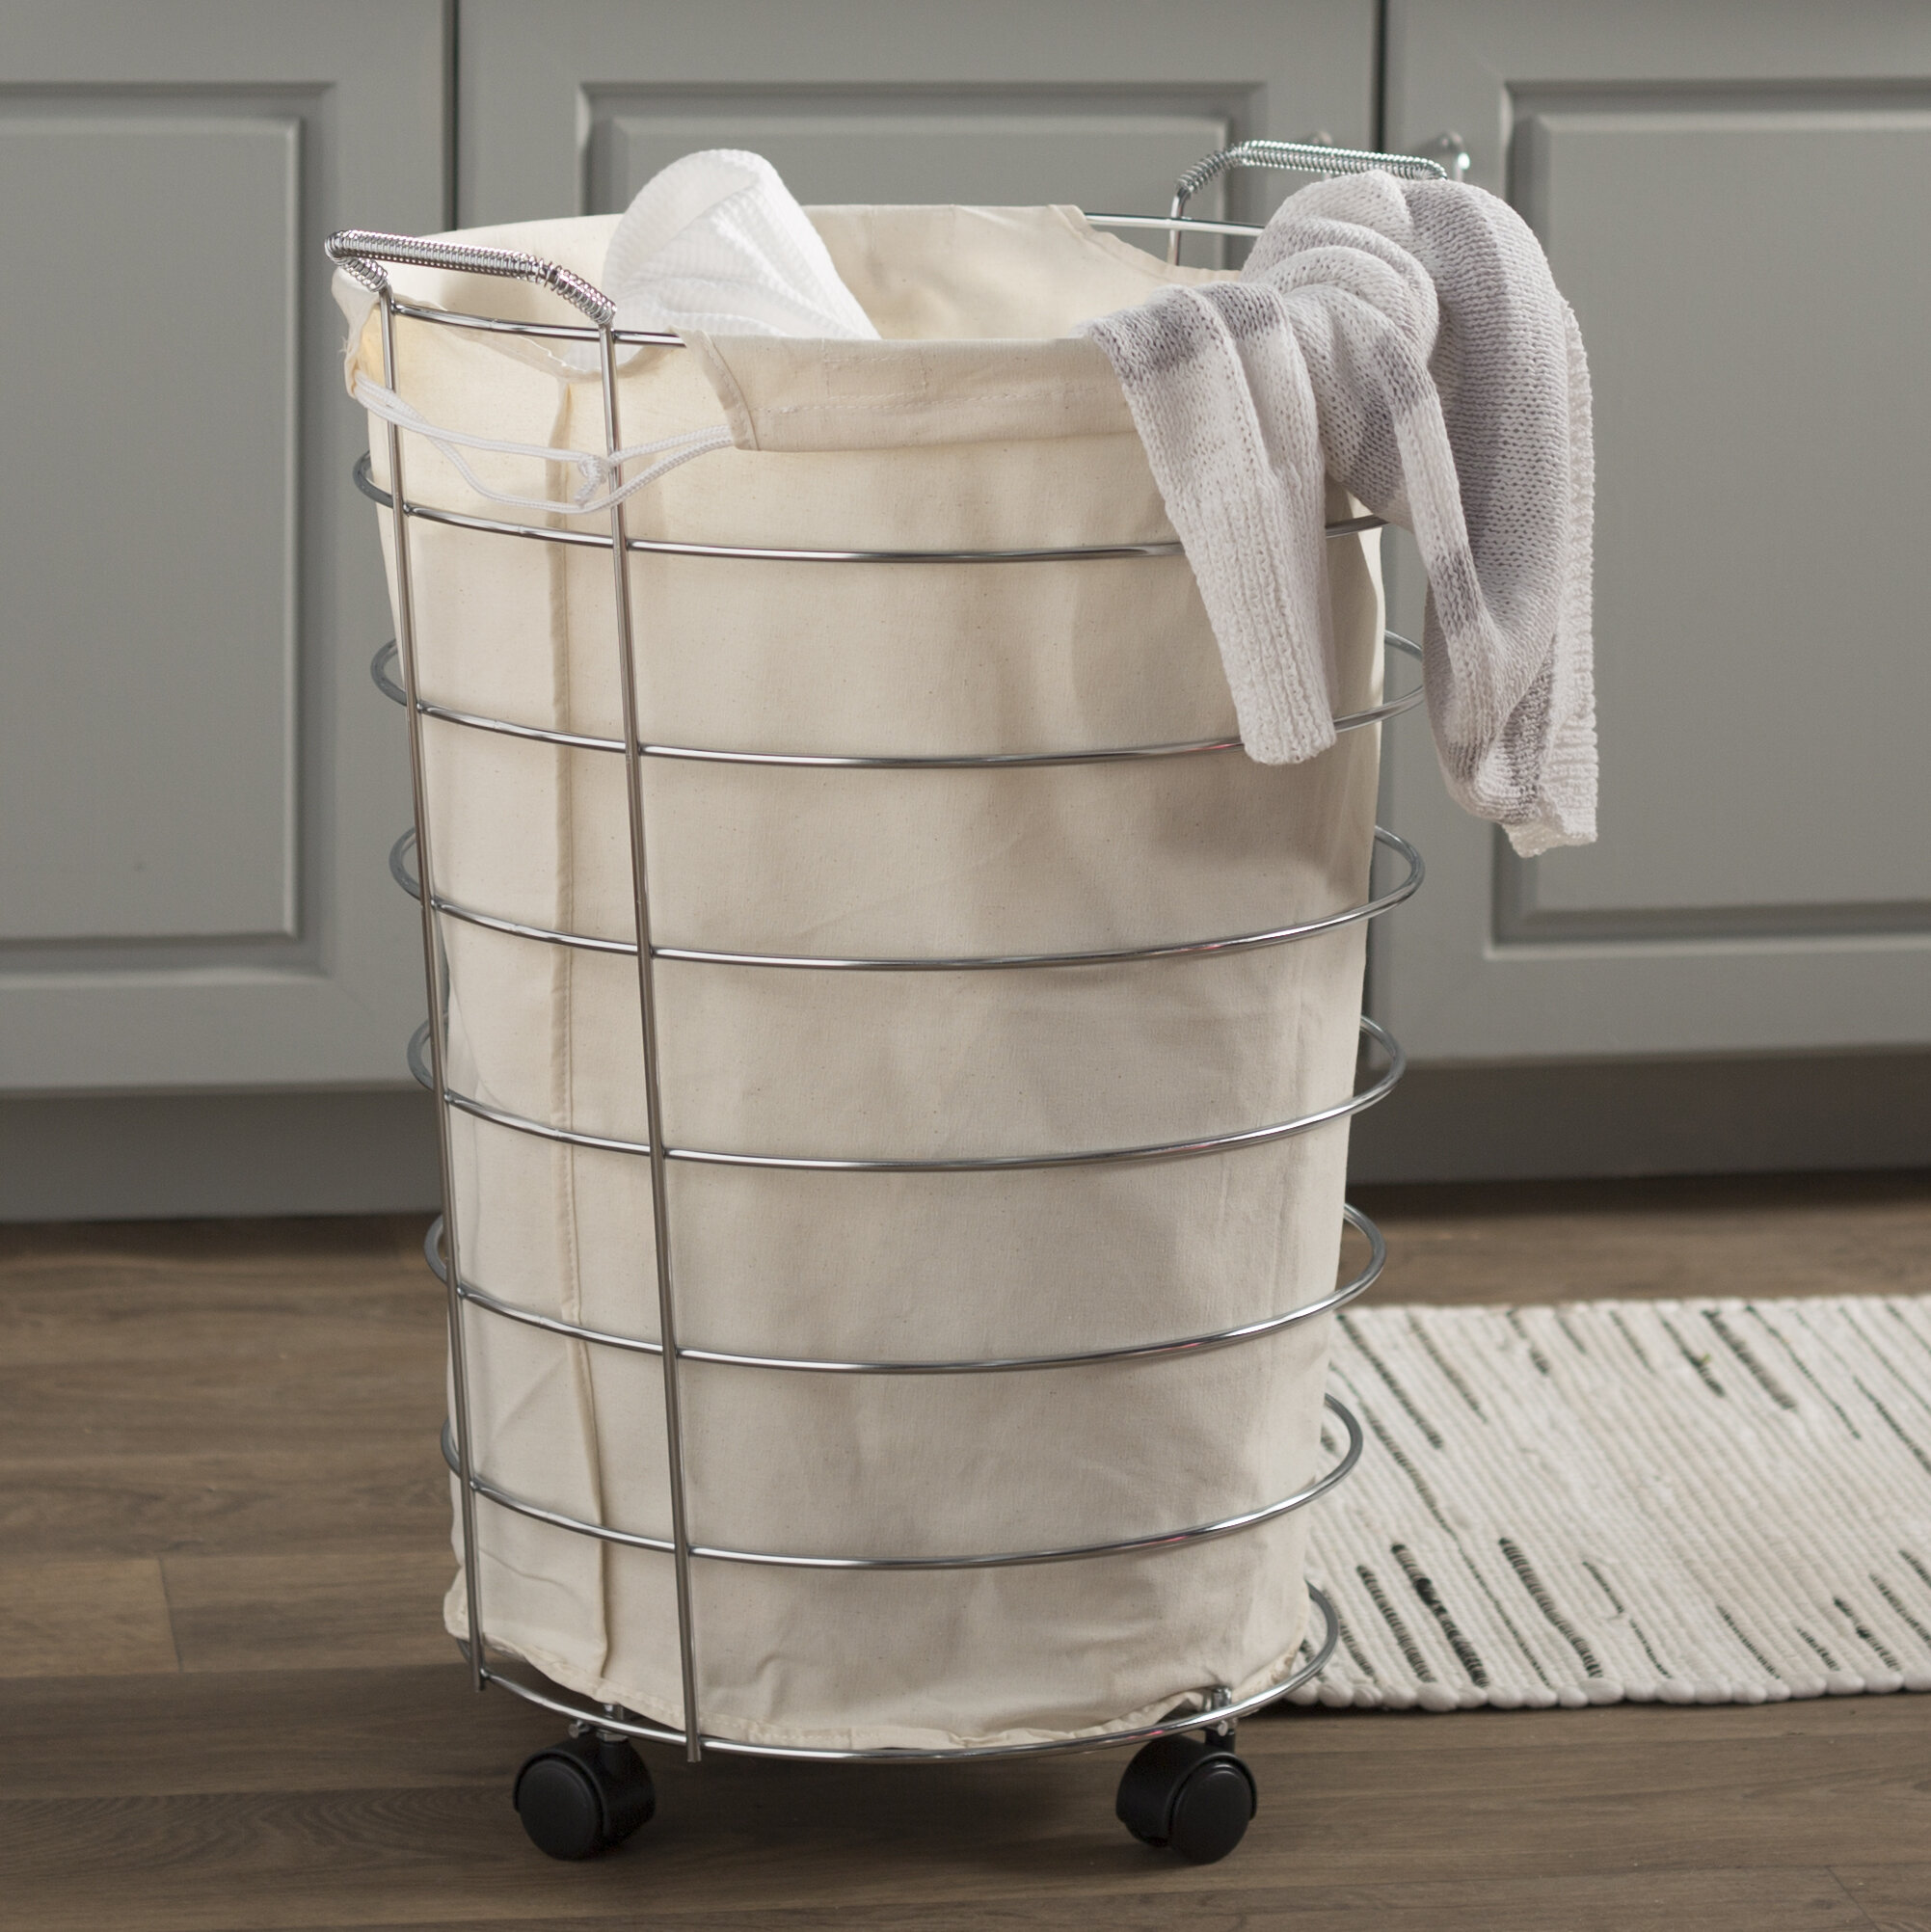 57a752ae9e50 Wayfair Basics Rolling Laundry Hamper   Reviews